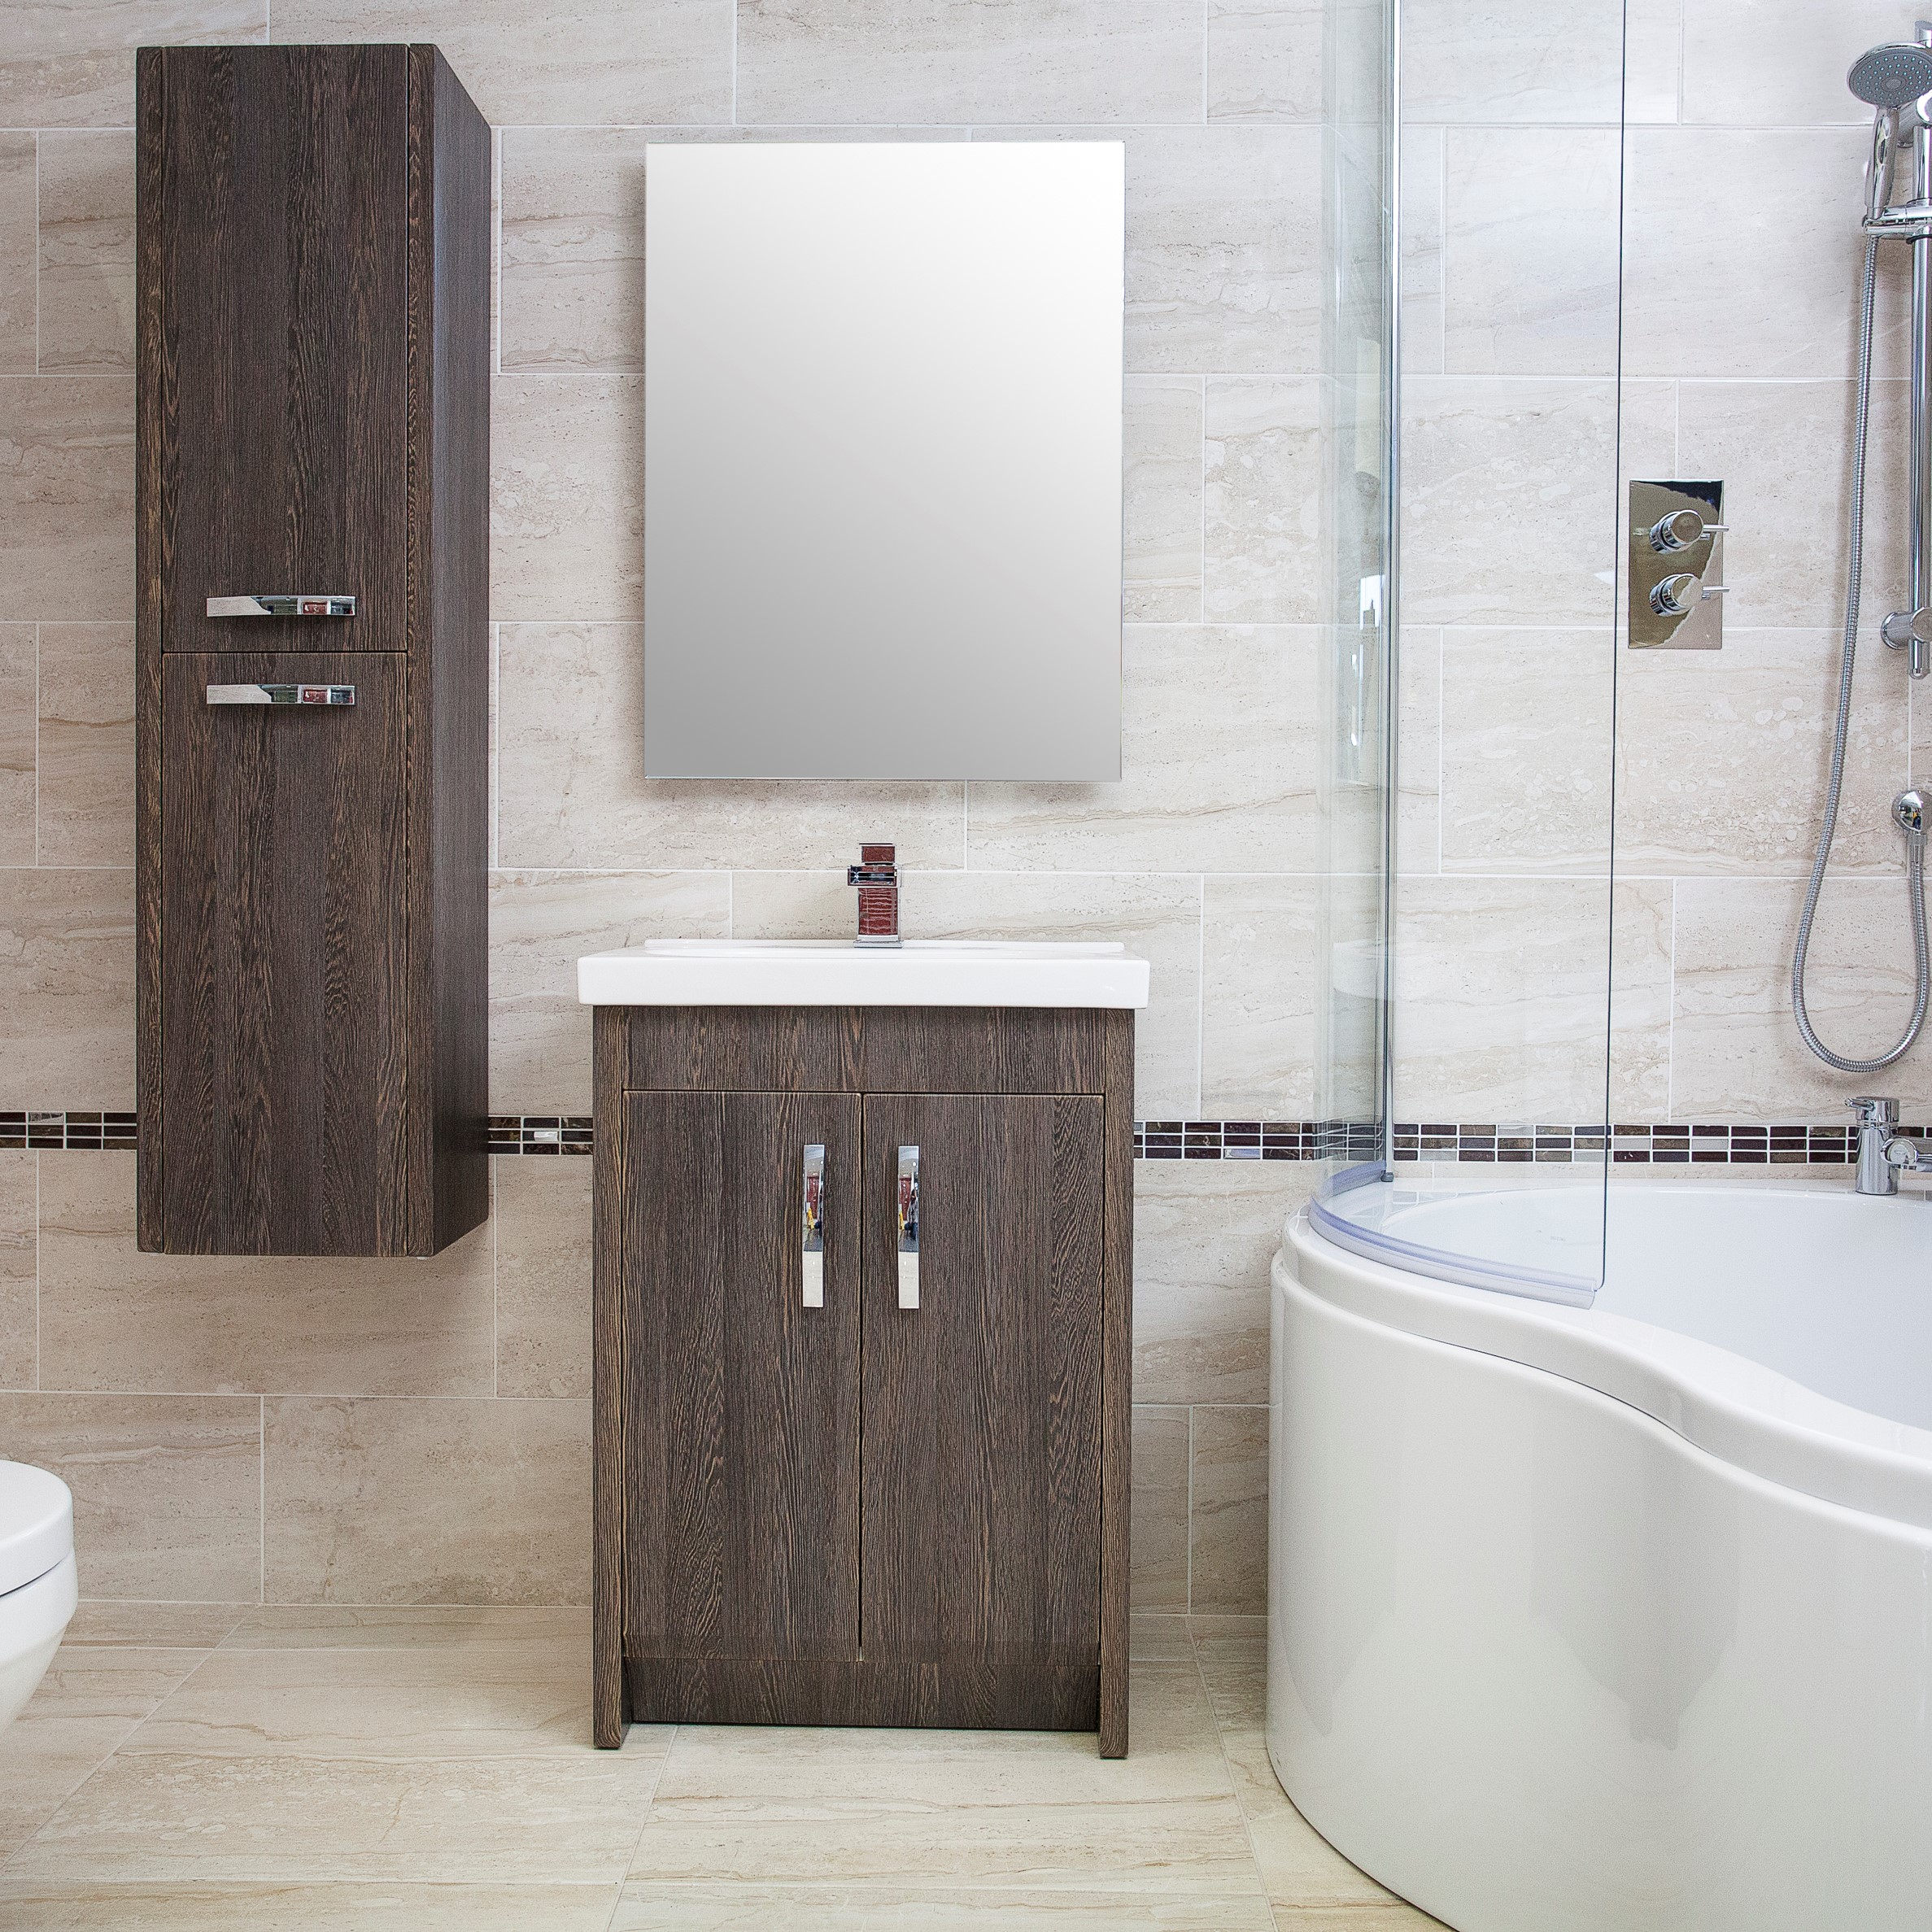 Victoria Marfil O'Connor Carroll Bathrooms & Tiles Dublin